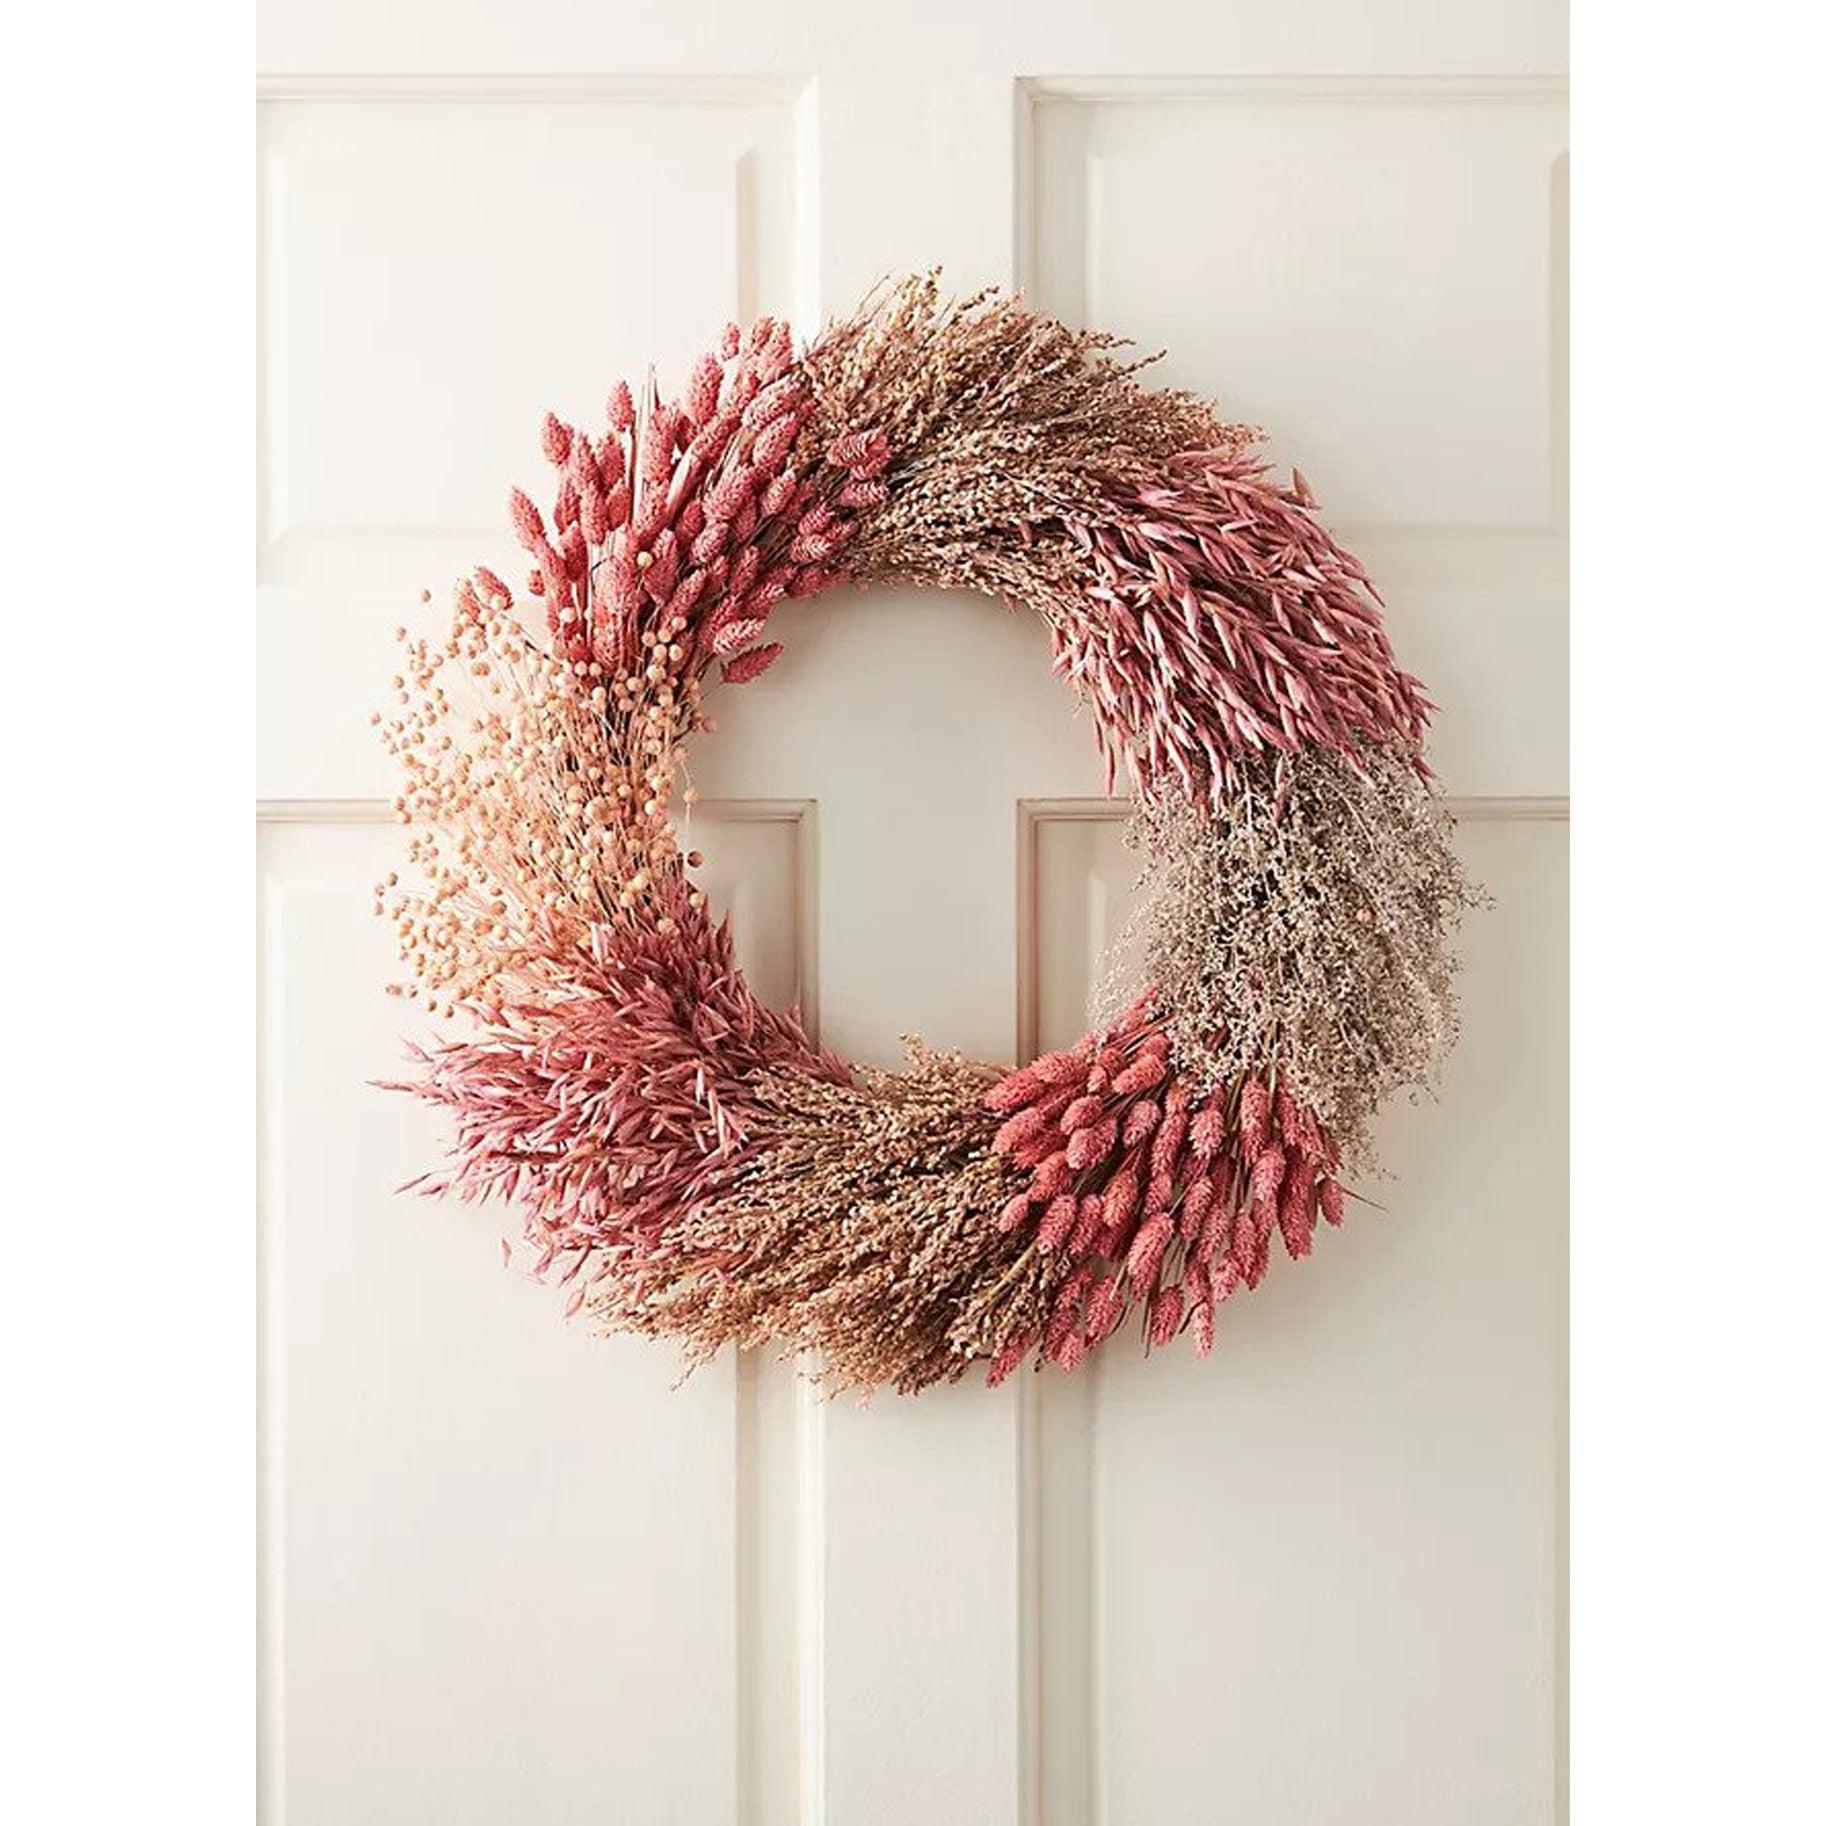 The Best Holiday Wreaths Option: Anthropologie Maison Wreath